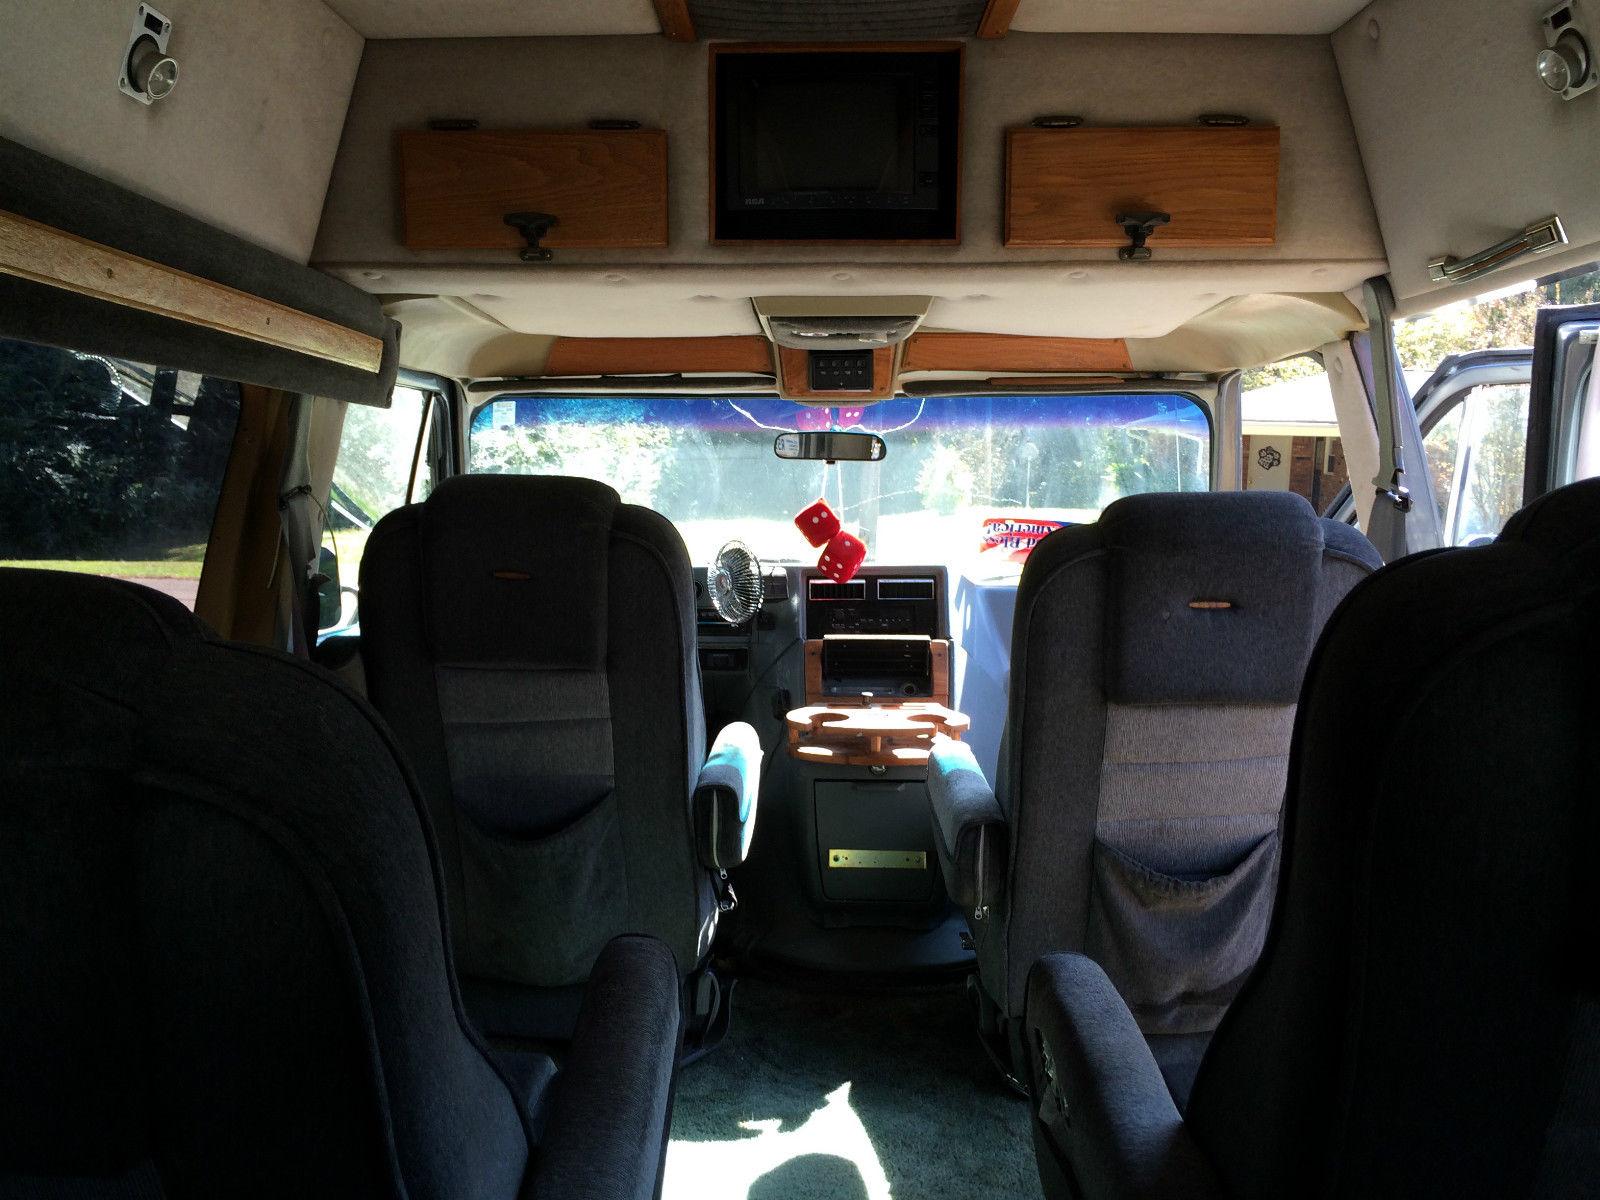 89 Chevy20 Jayco Conversion Van Classic Chevrolet G20